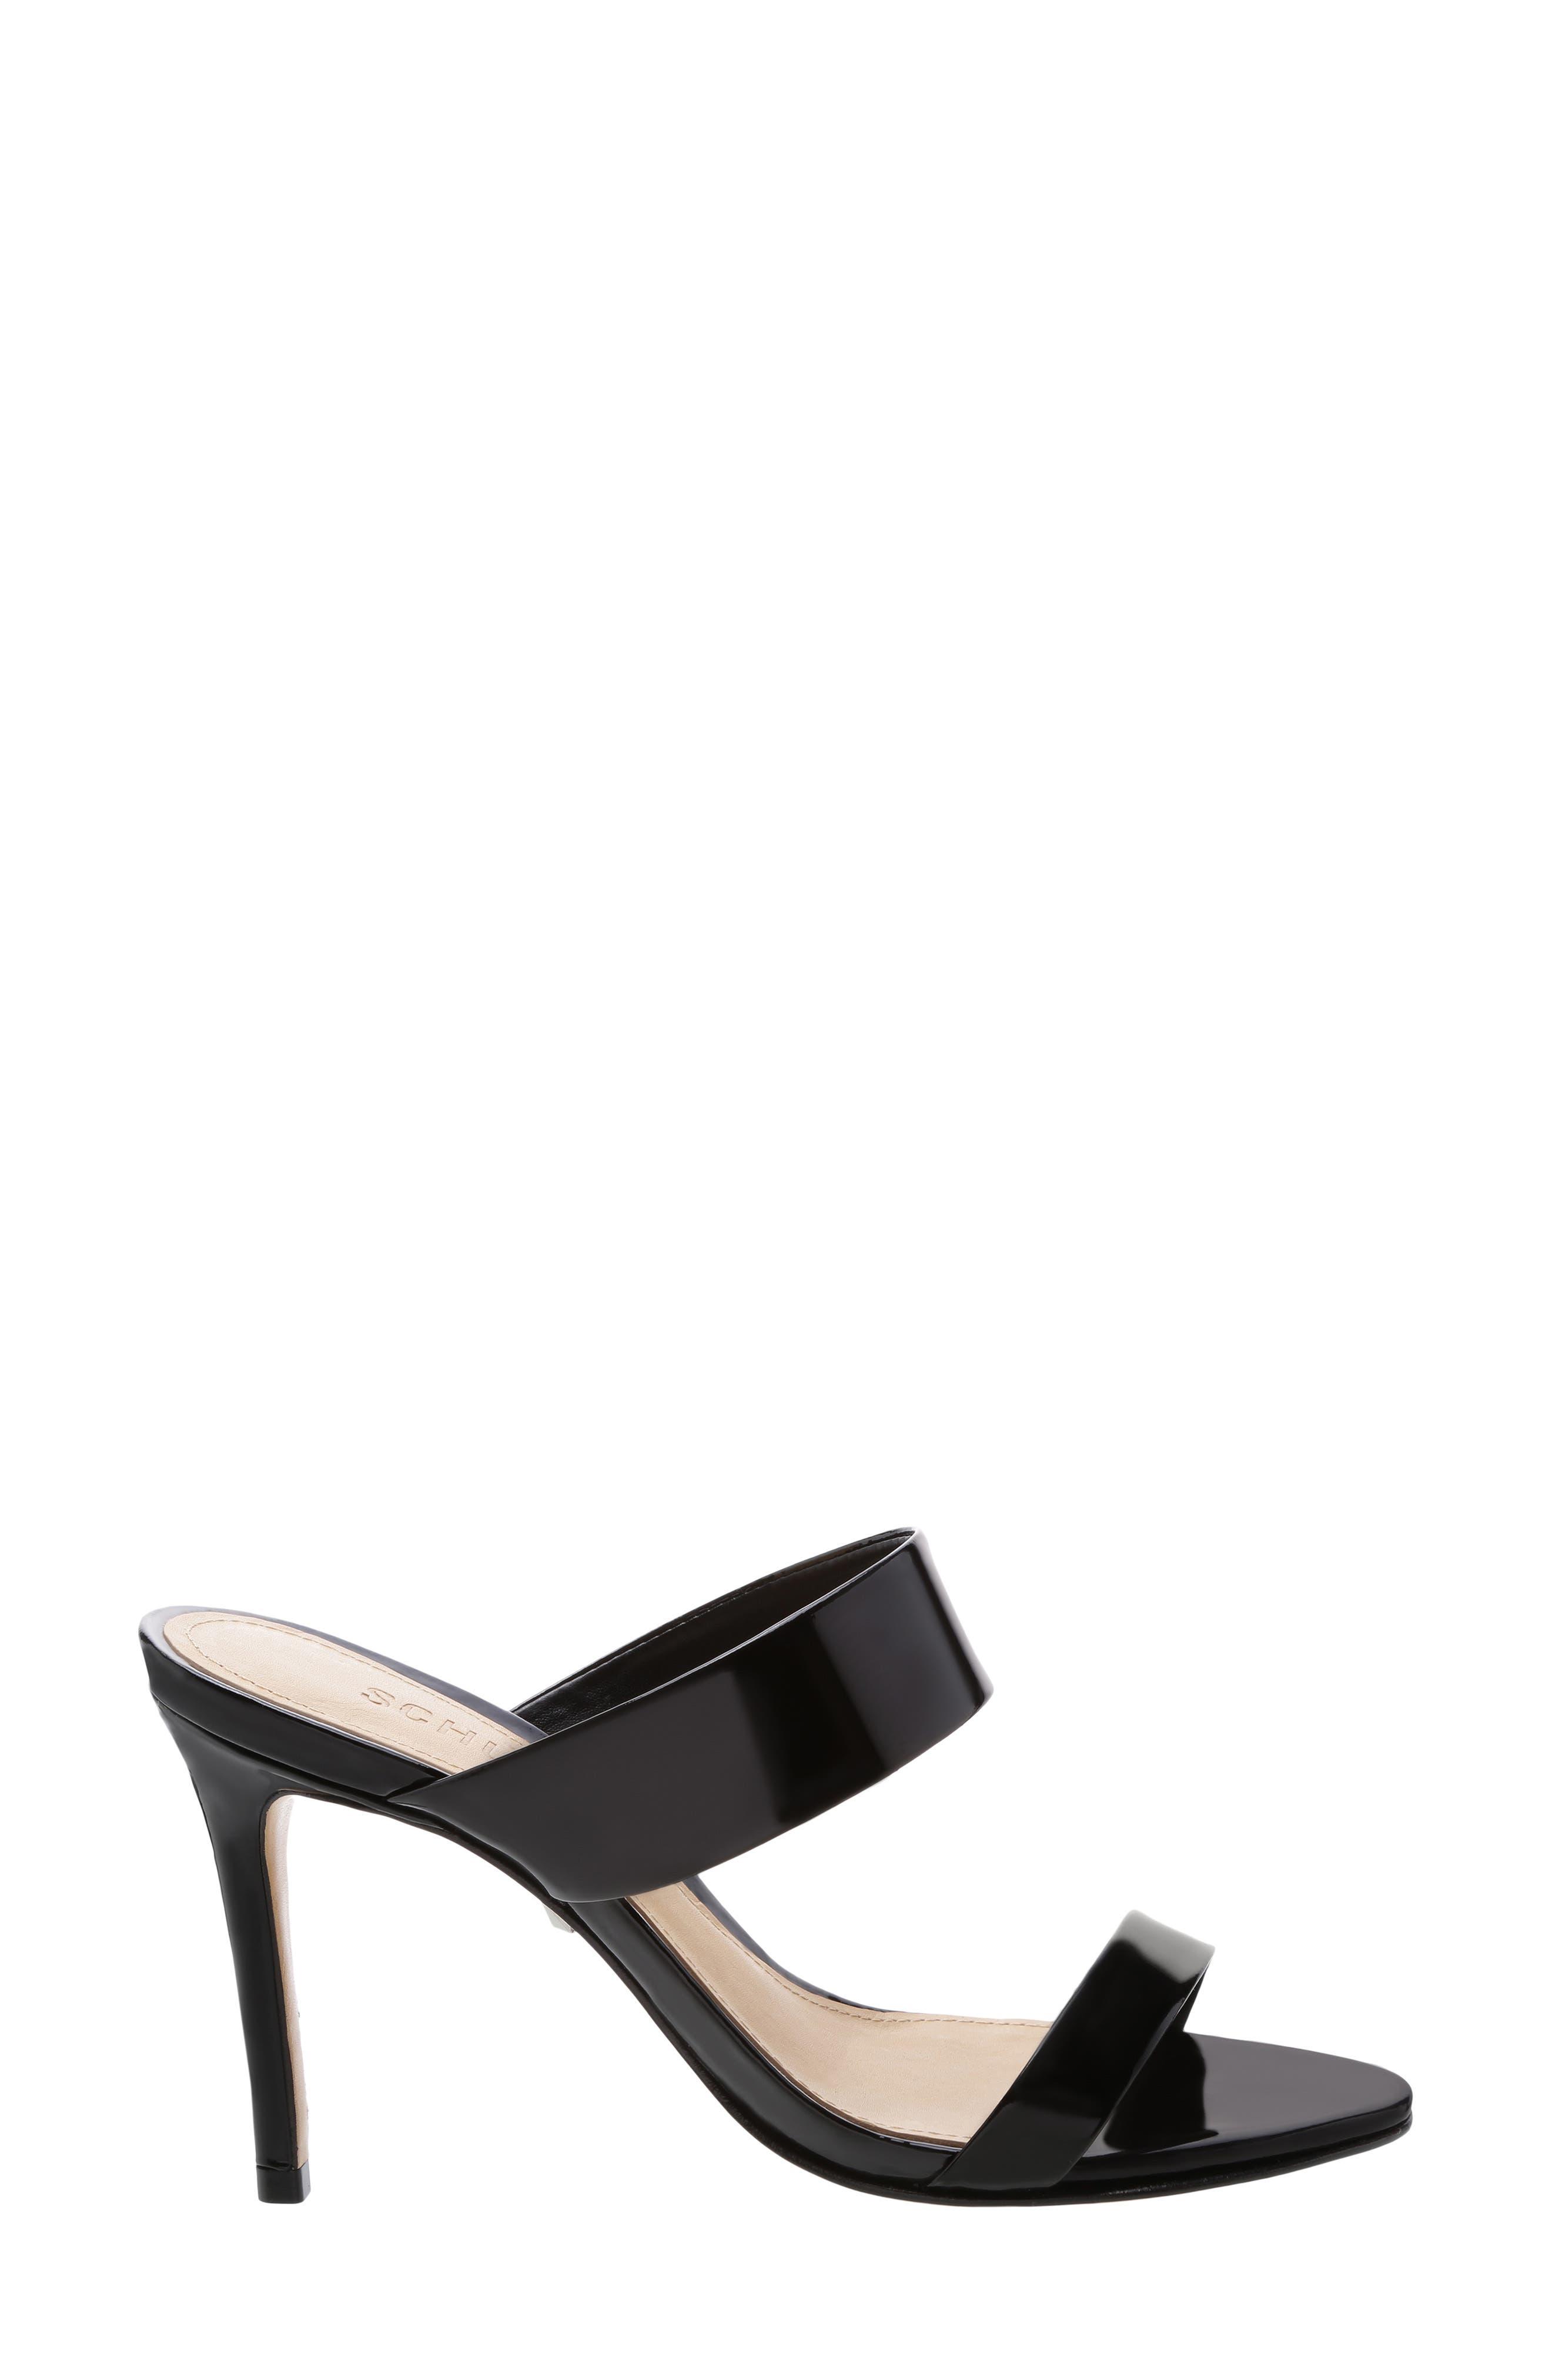 Stiletto Slide Sandal,                             Alternate thumbnail 3, color,                             BLACK PATENT LEATHER